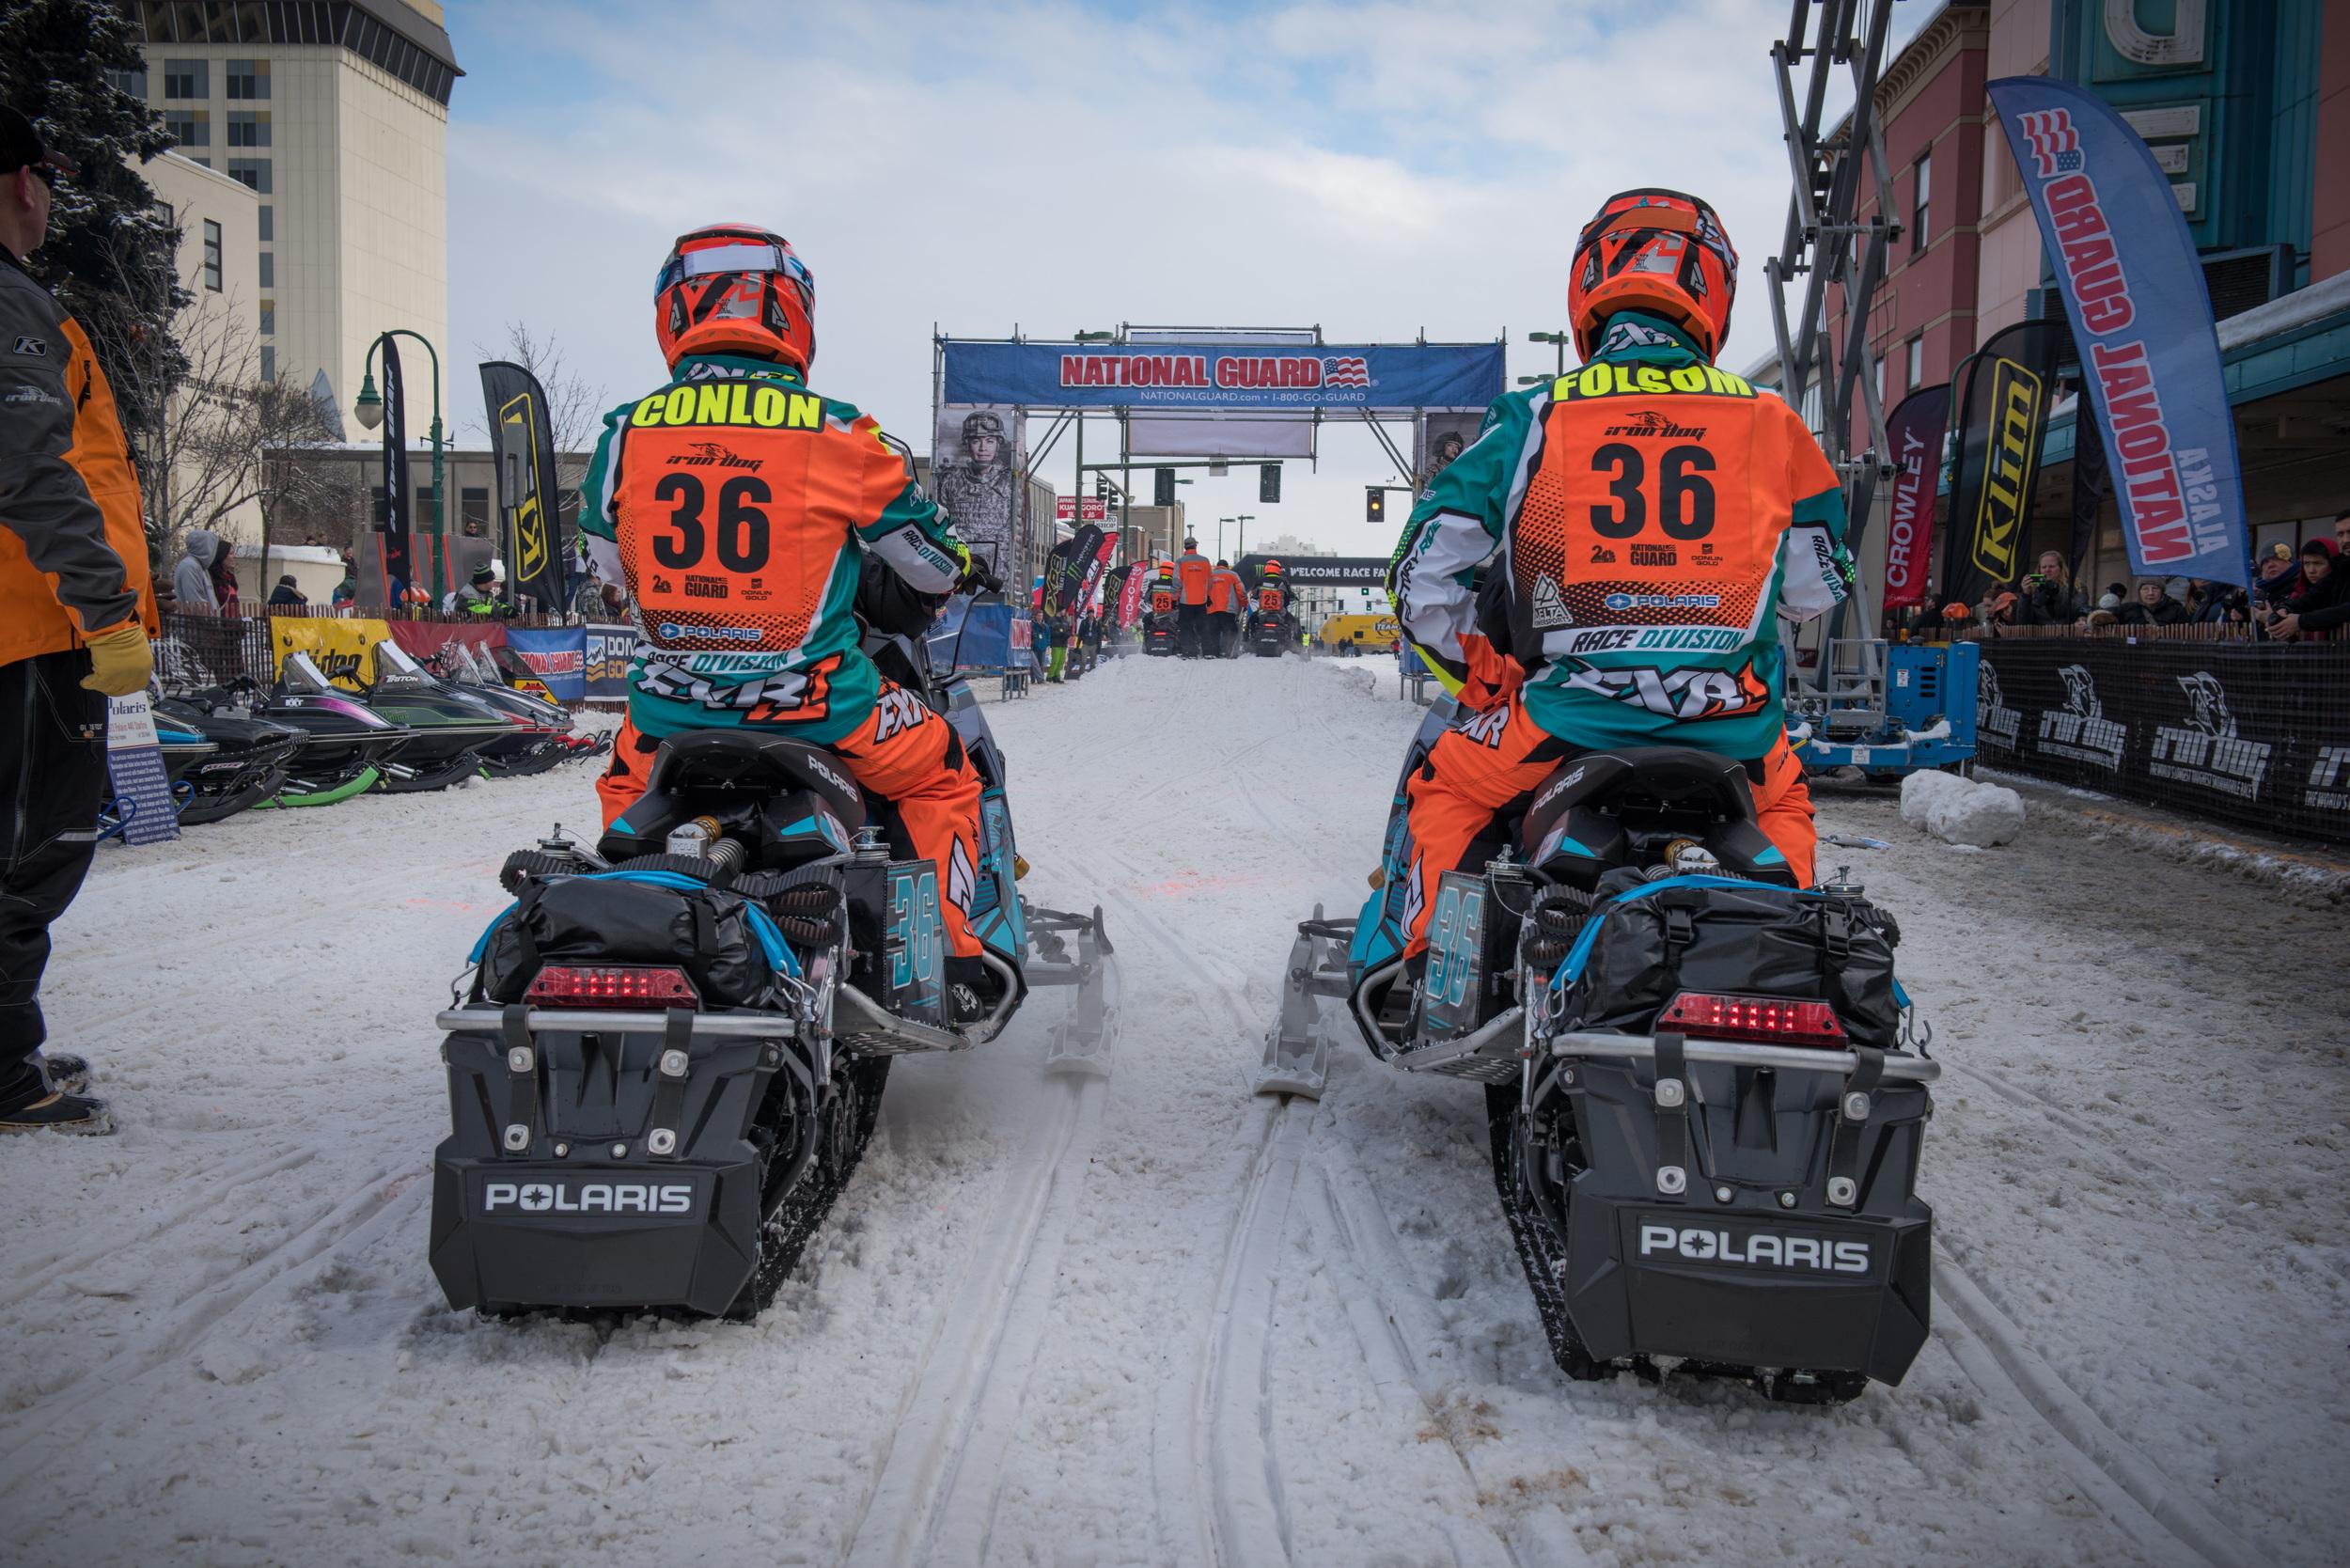 Iron Dog is World's Longest, Toughest Snowmobile Race